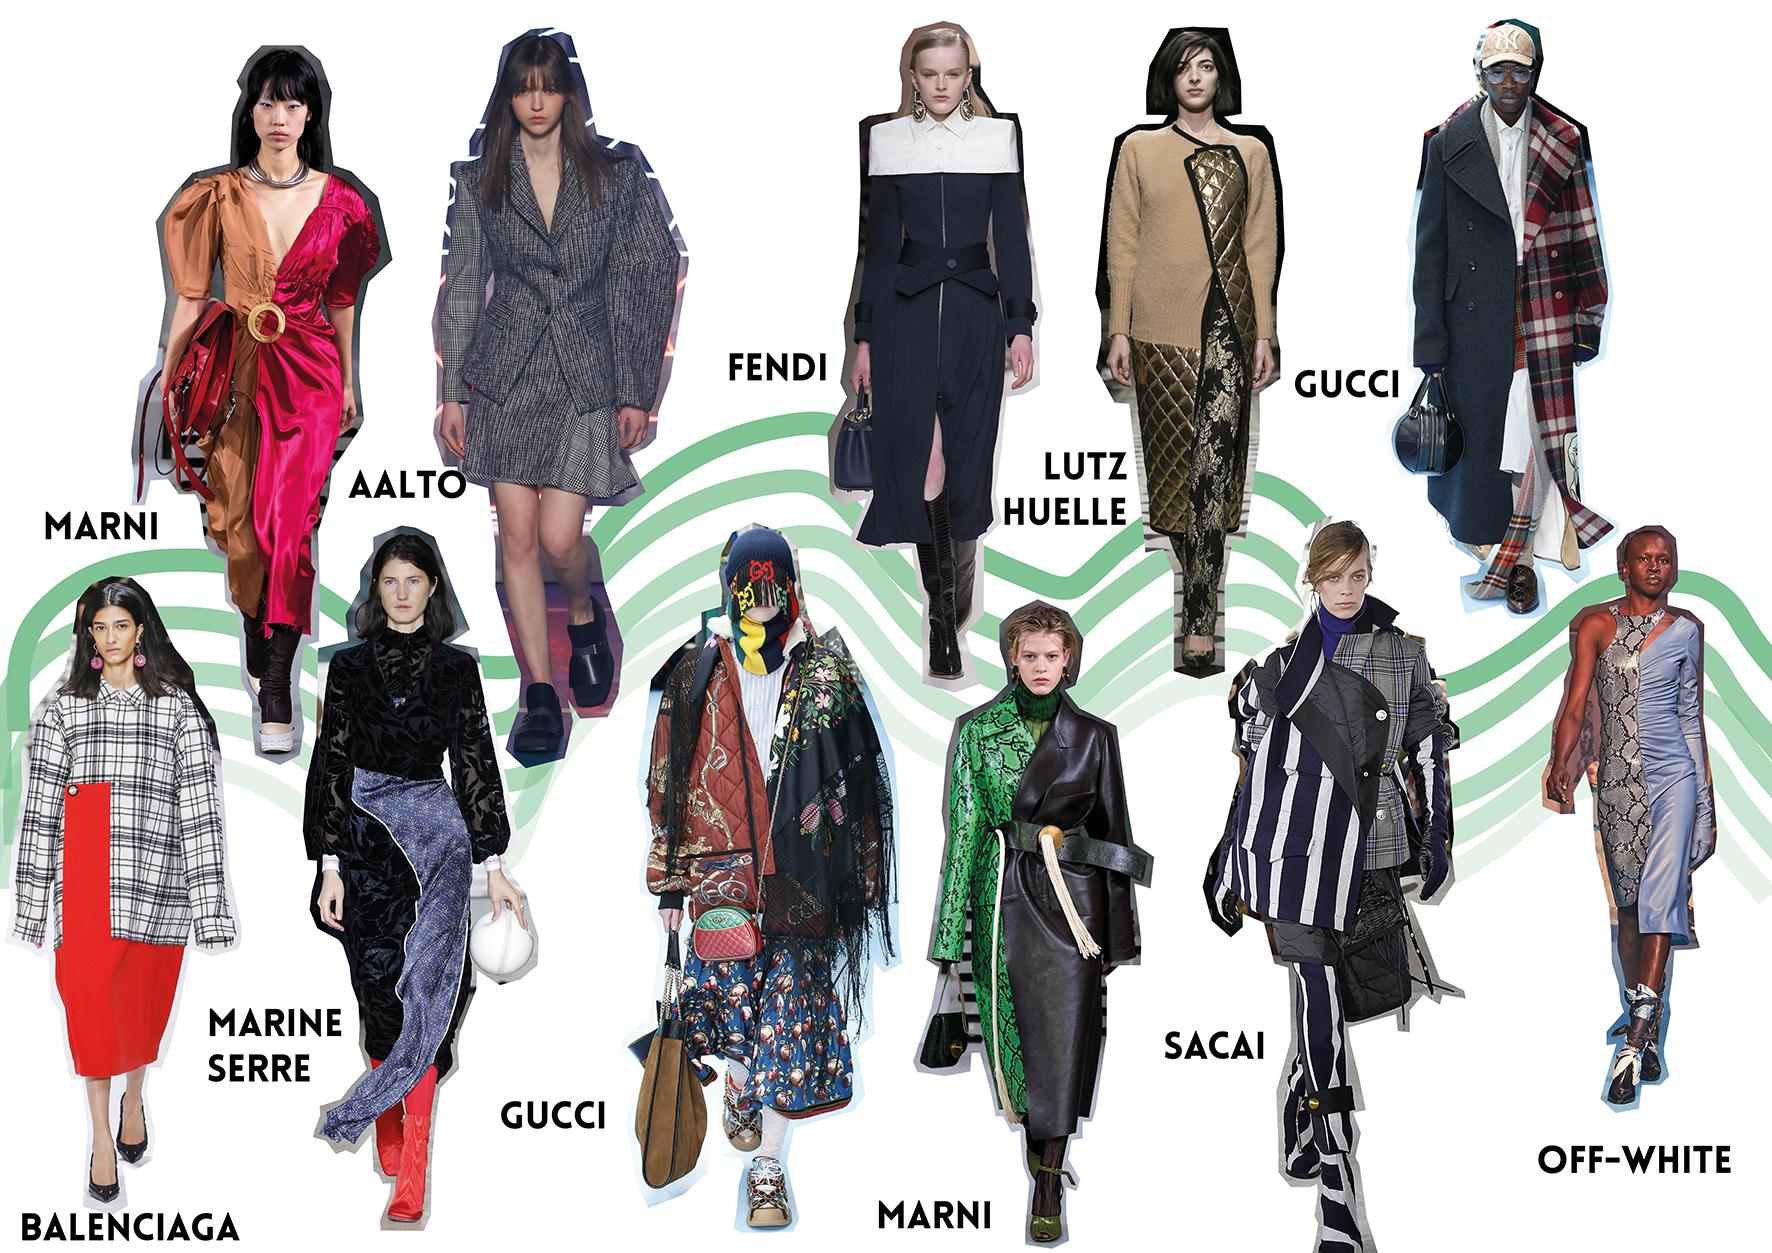 Fashion week hiver 18/19 défilé hiver winter 18/19 fendi aalto marni